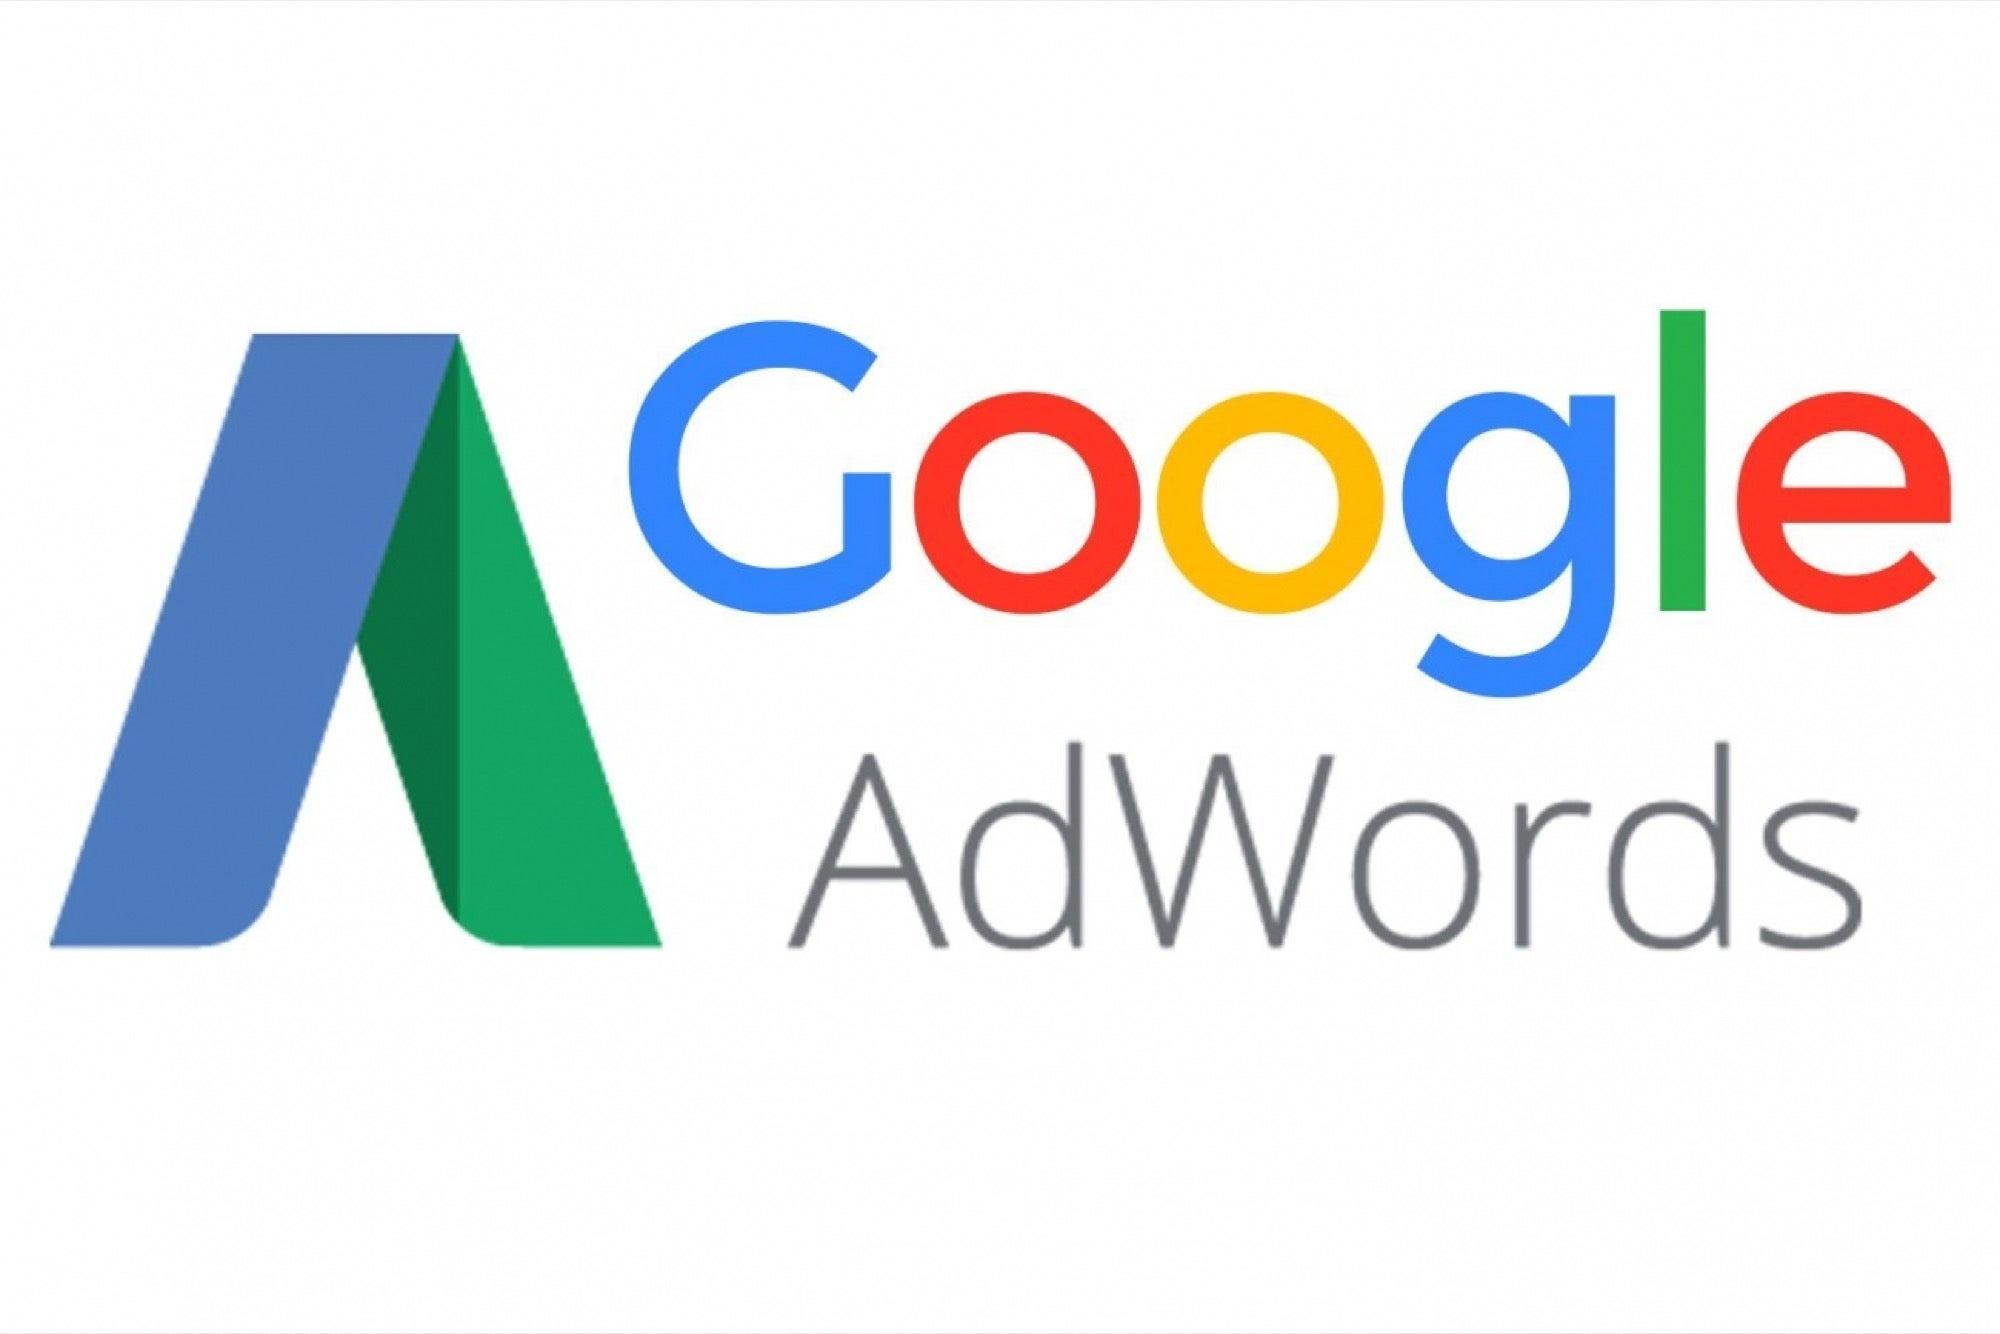 Google_Adwords-min.jpeg